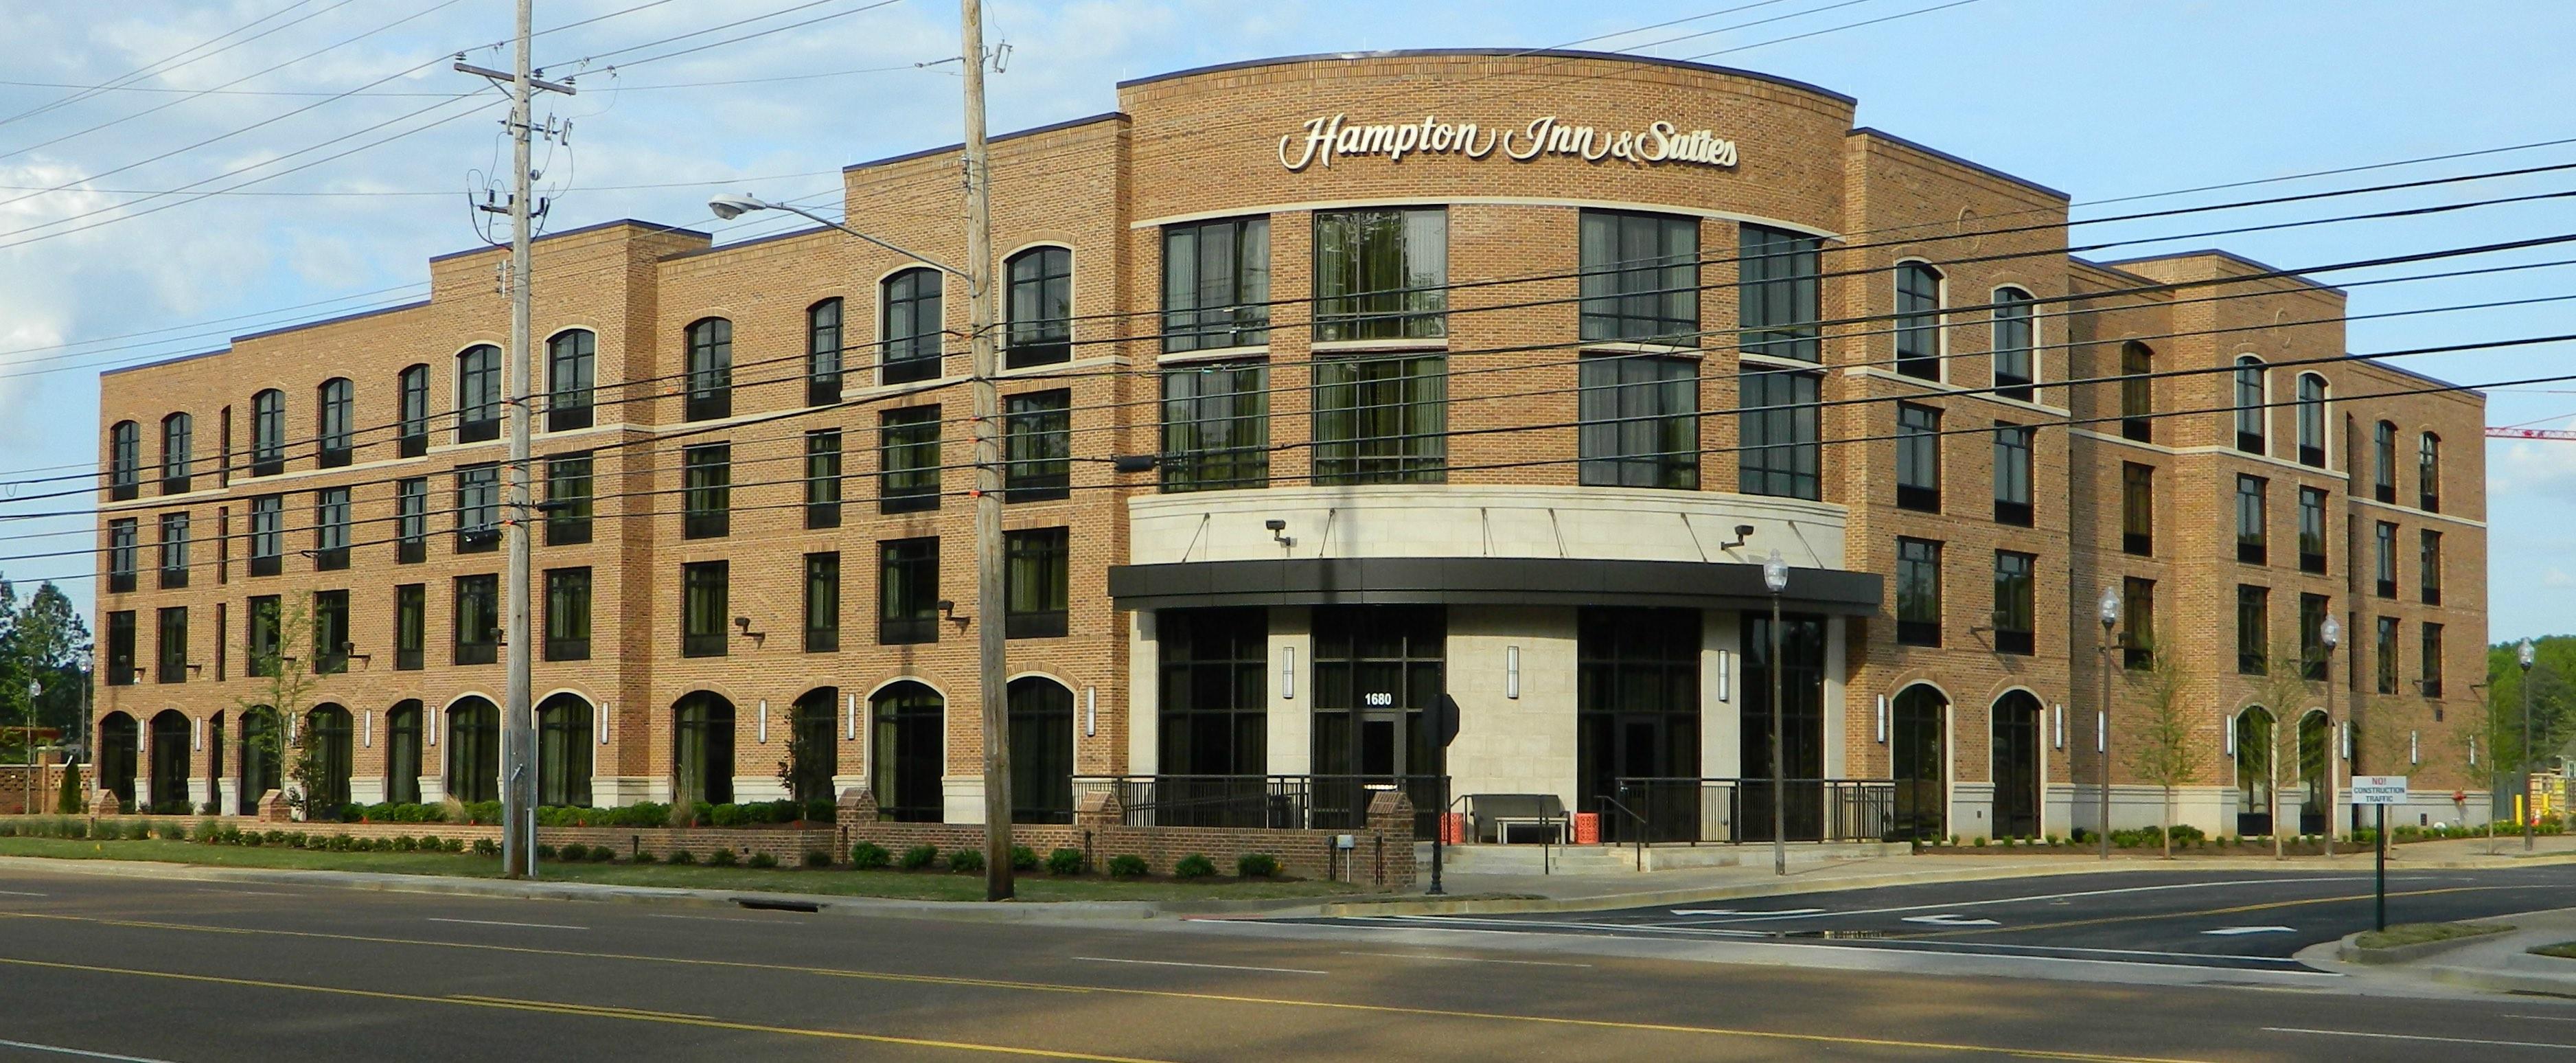 Hampton inn suites in germantown tn opens hospitality net for New hotels in memphis tn